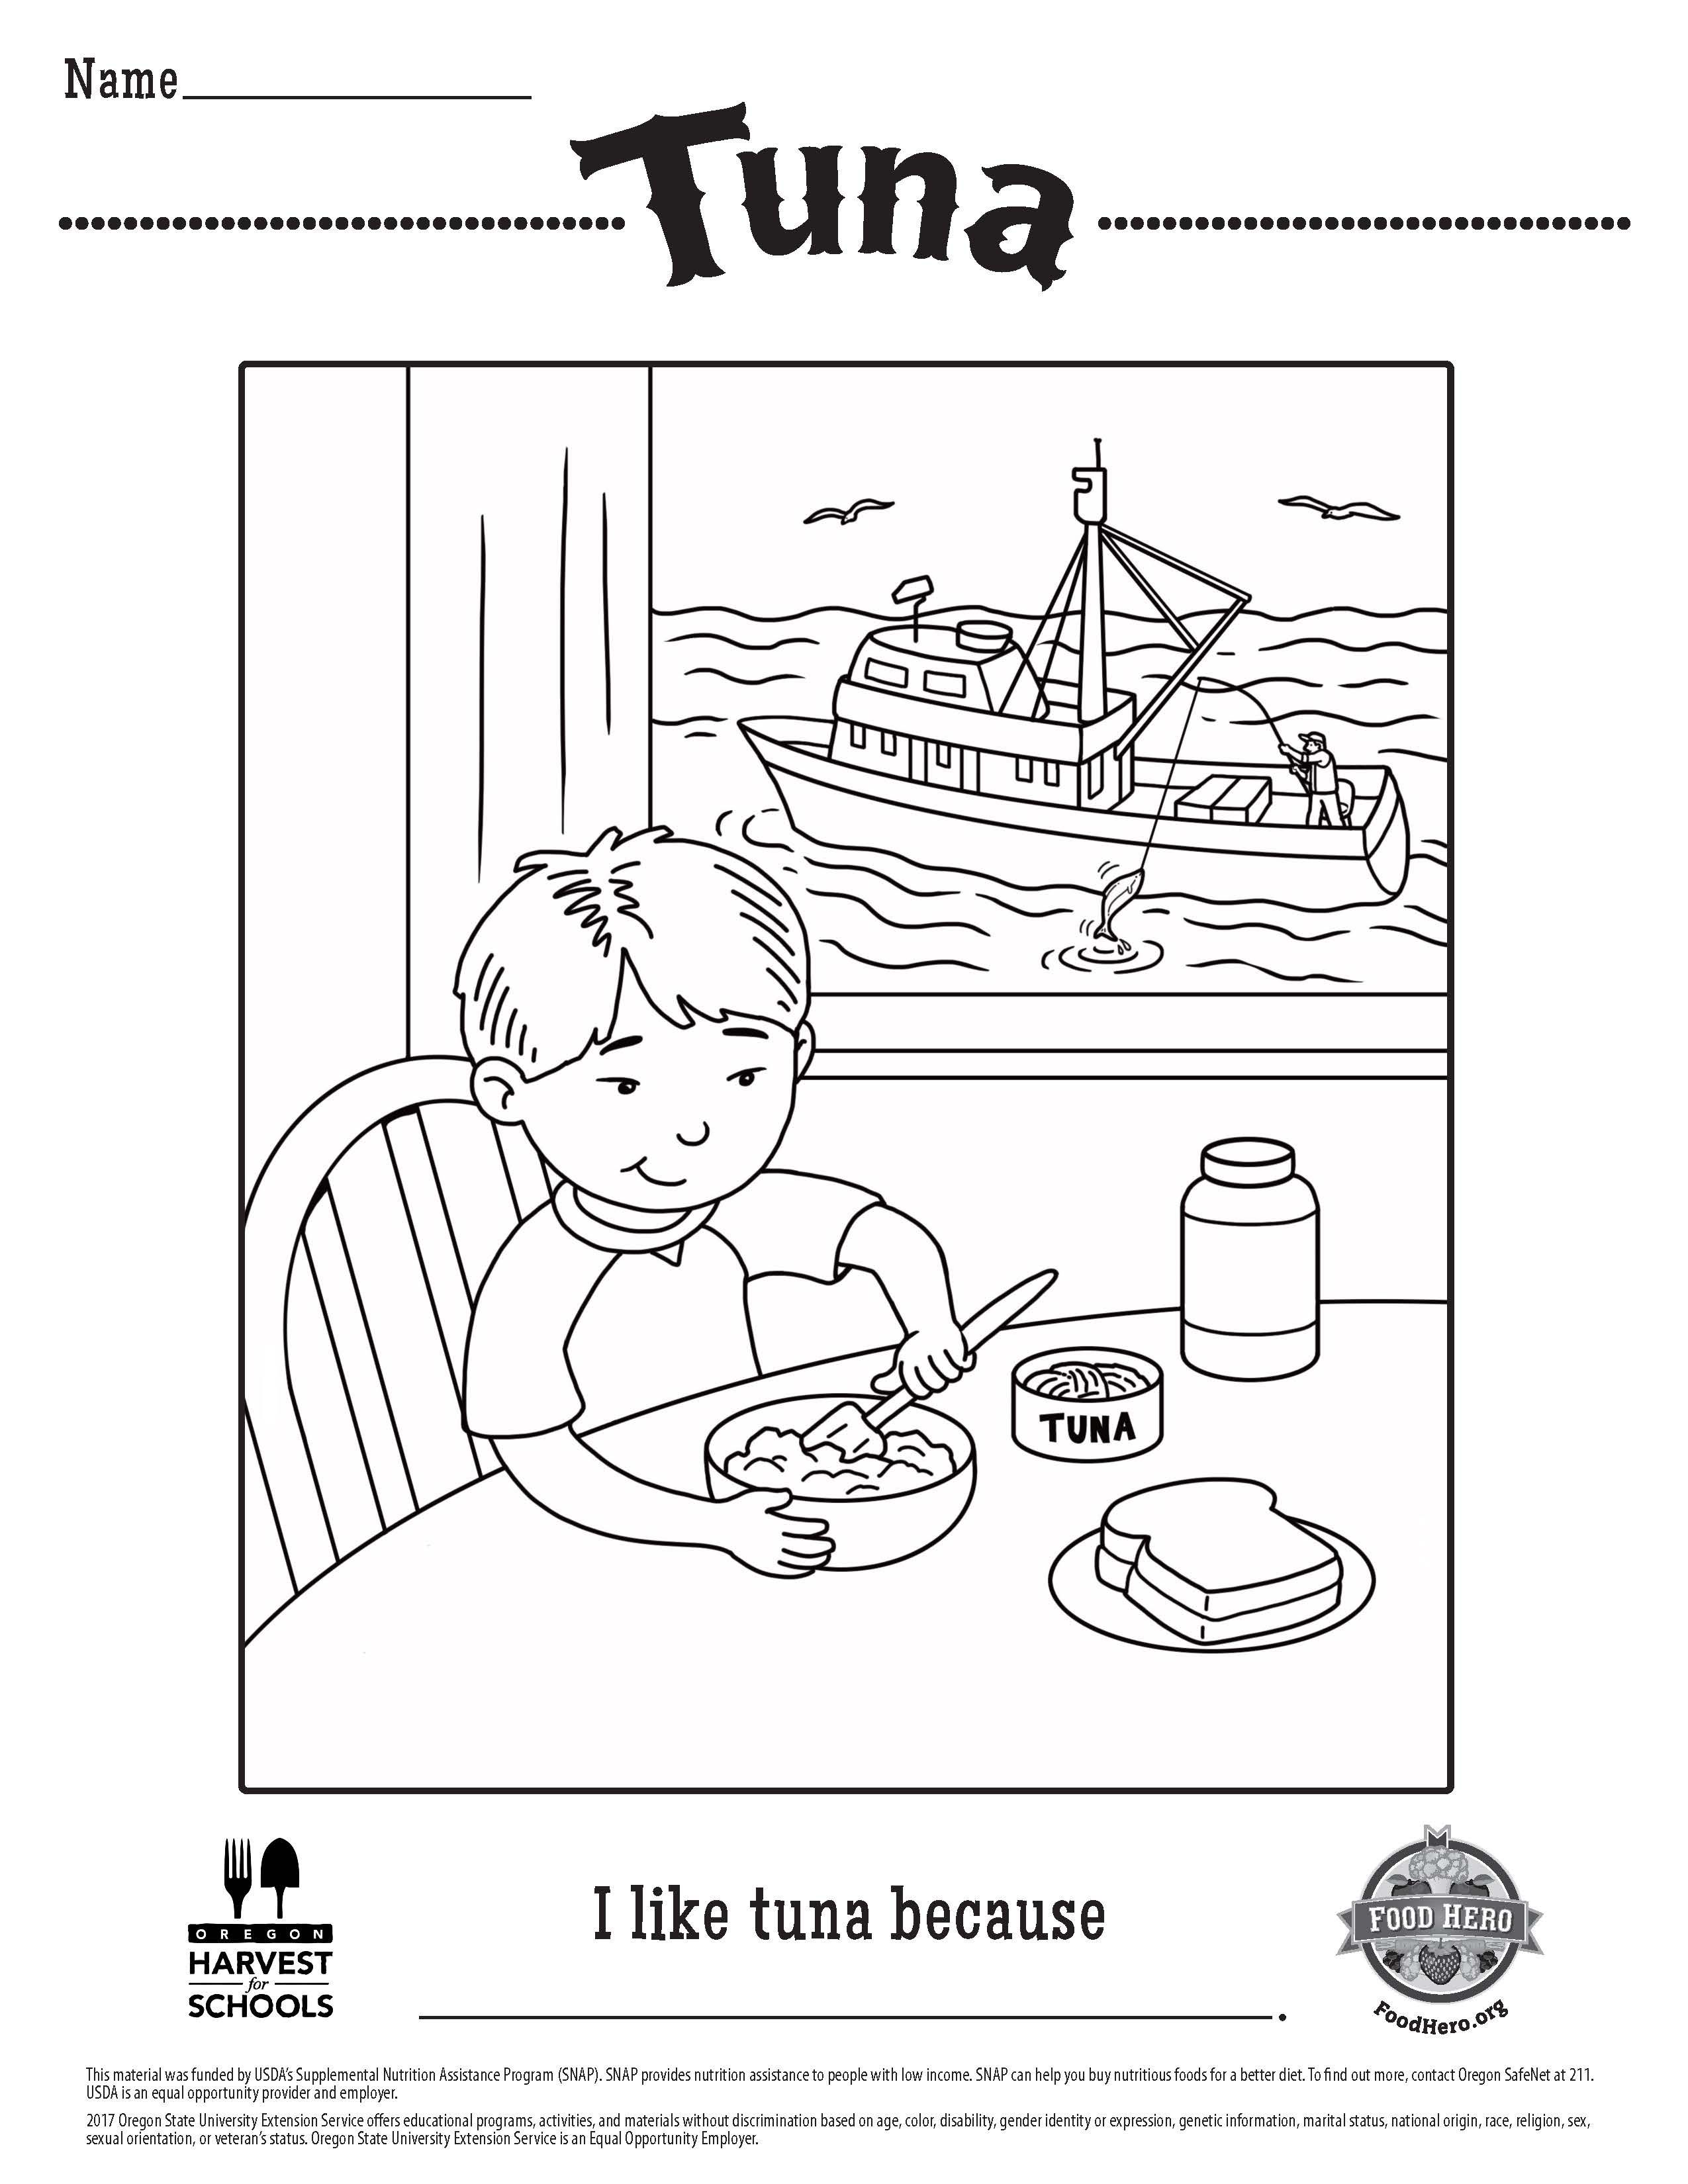 - Food Hero Free Printable Children's Coloring Sheet Tuna. Kids